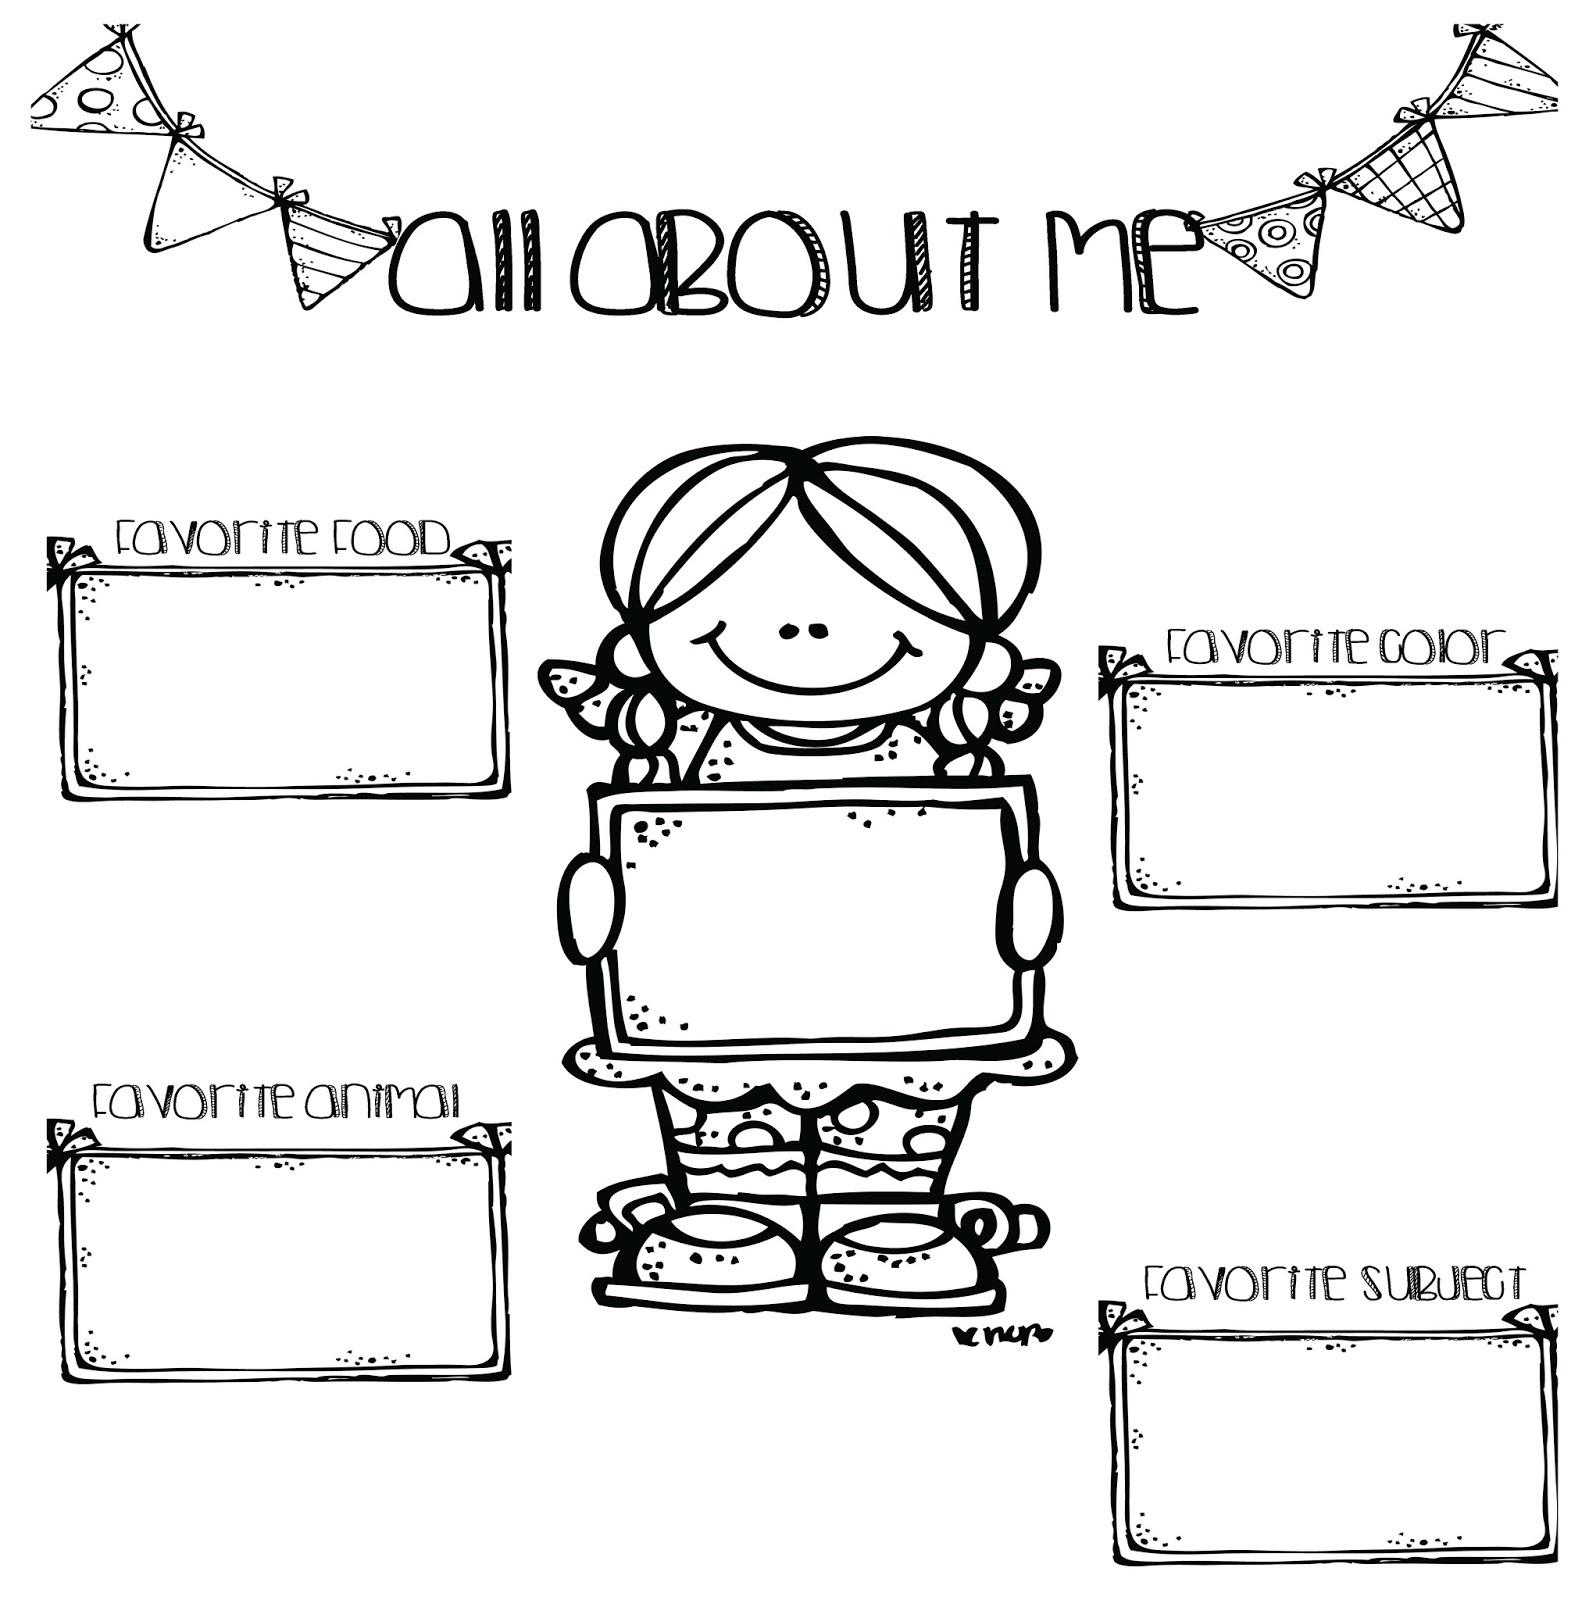 worksheet About Me Worksheet all about me worksheetstake the pen bolos allaboutme1 allaboutmegirl